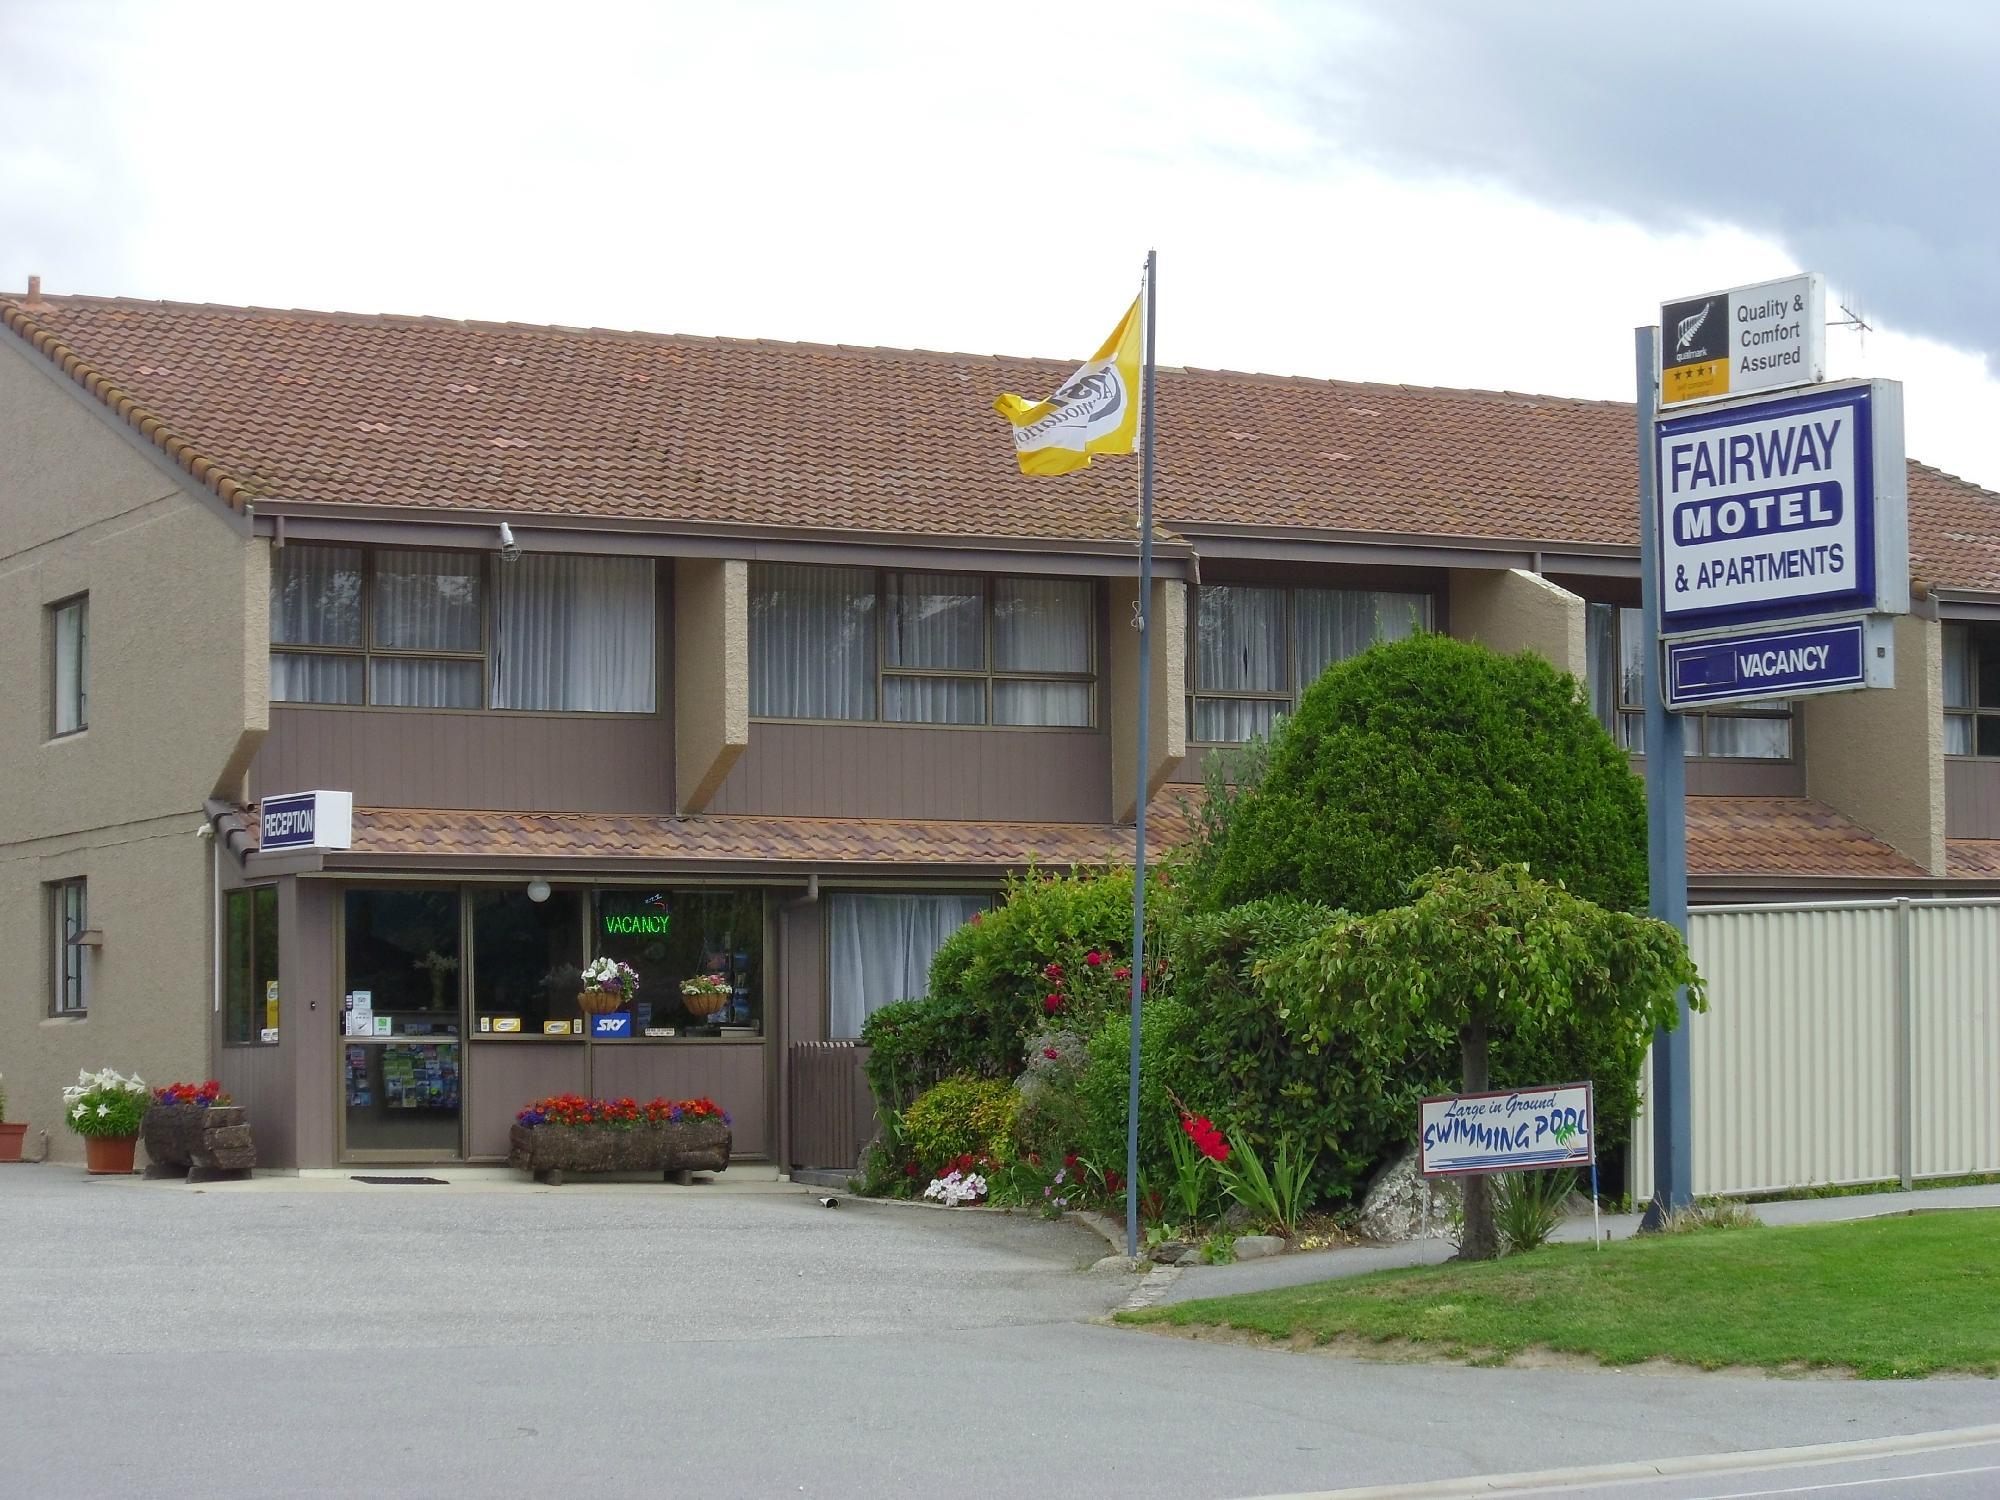 Fairway Motel